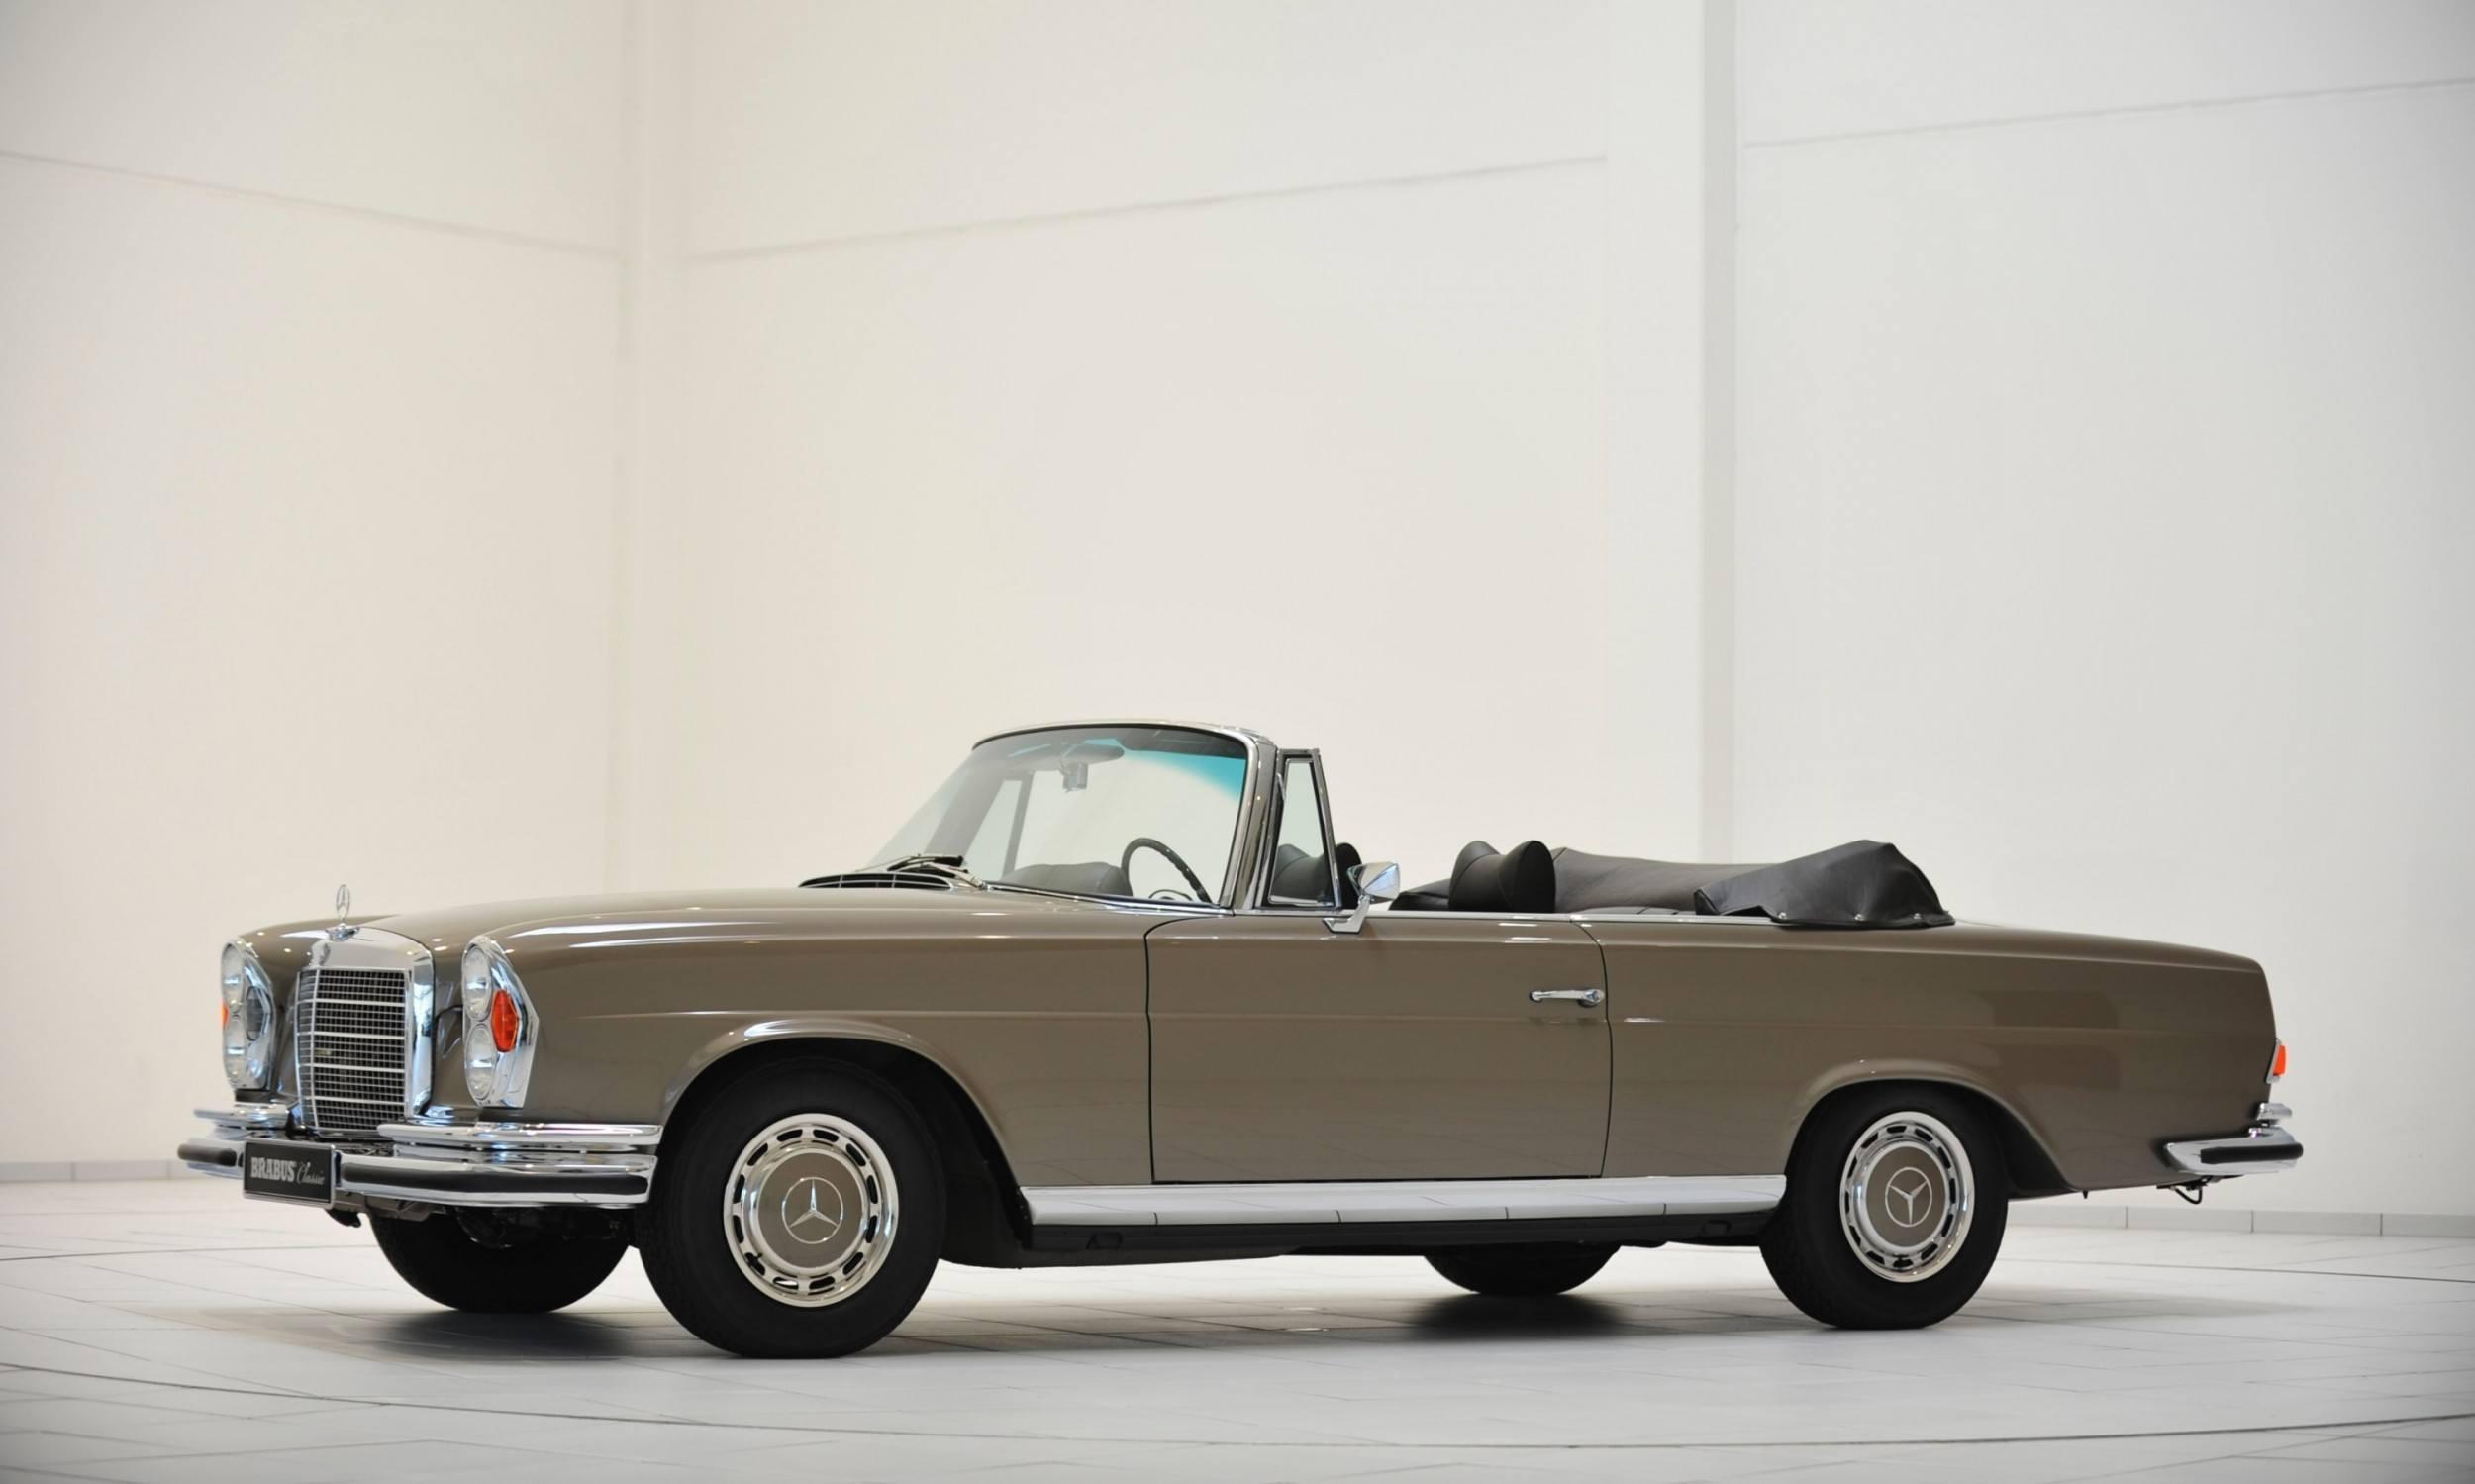 Brabus classic mercedes benz restoration examples as new for Mercedes benz restoration